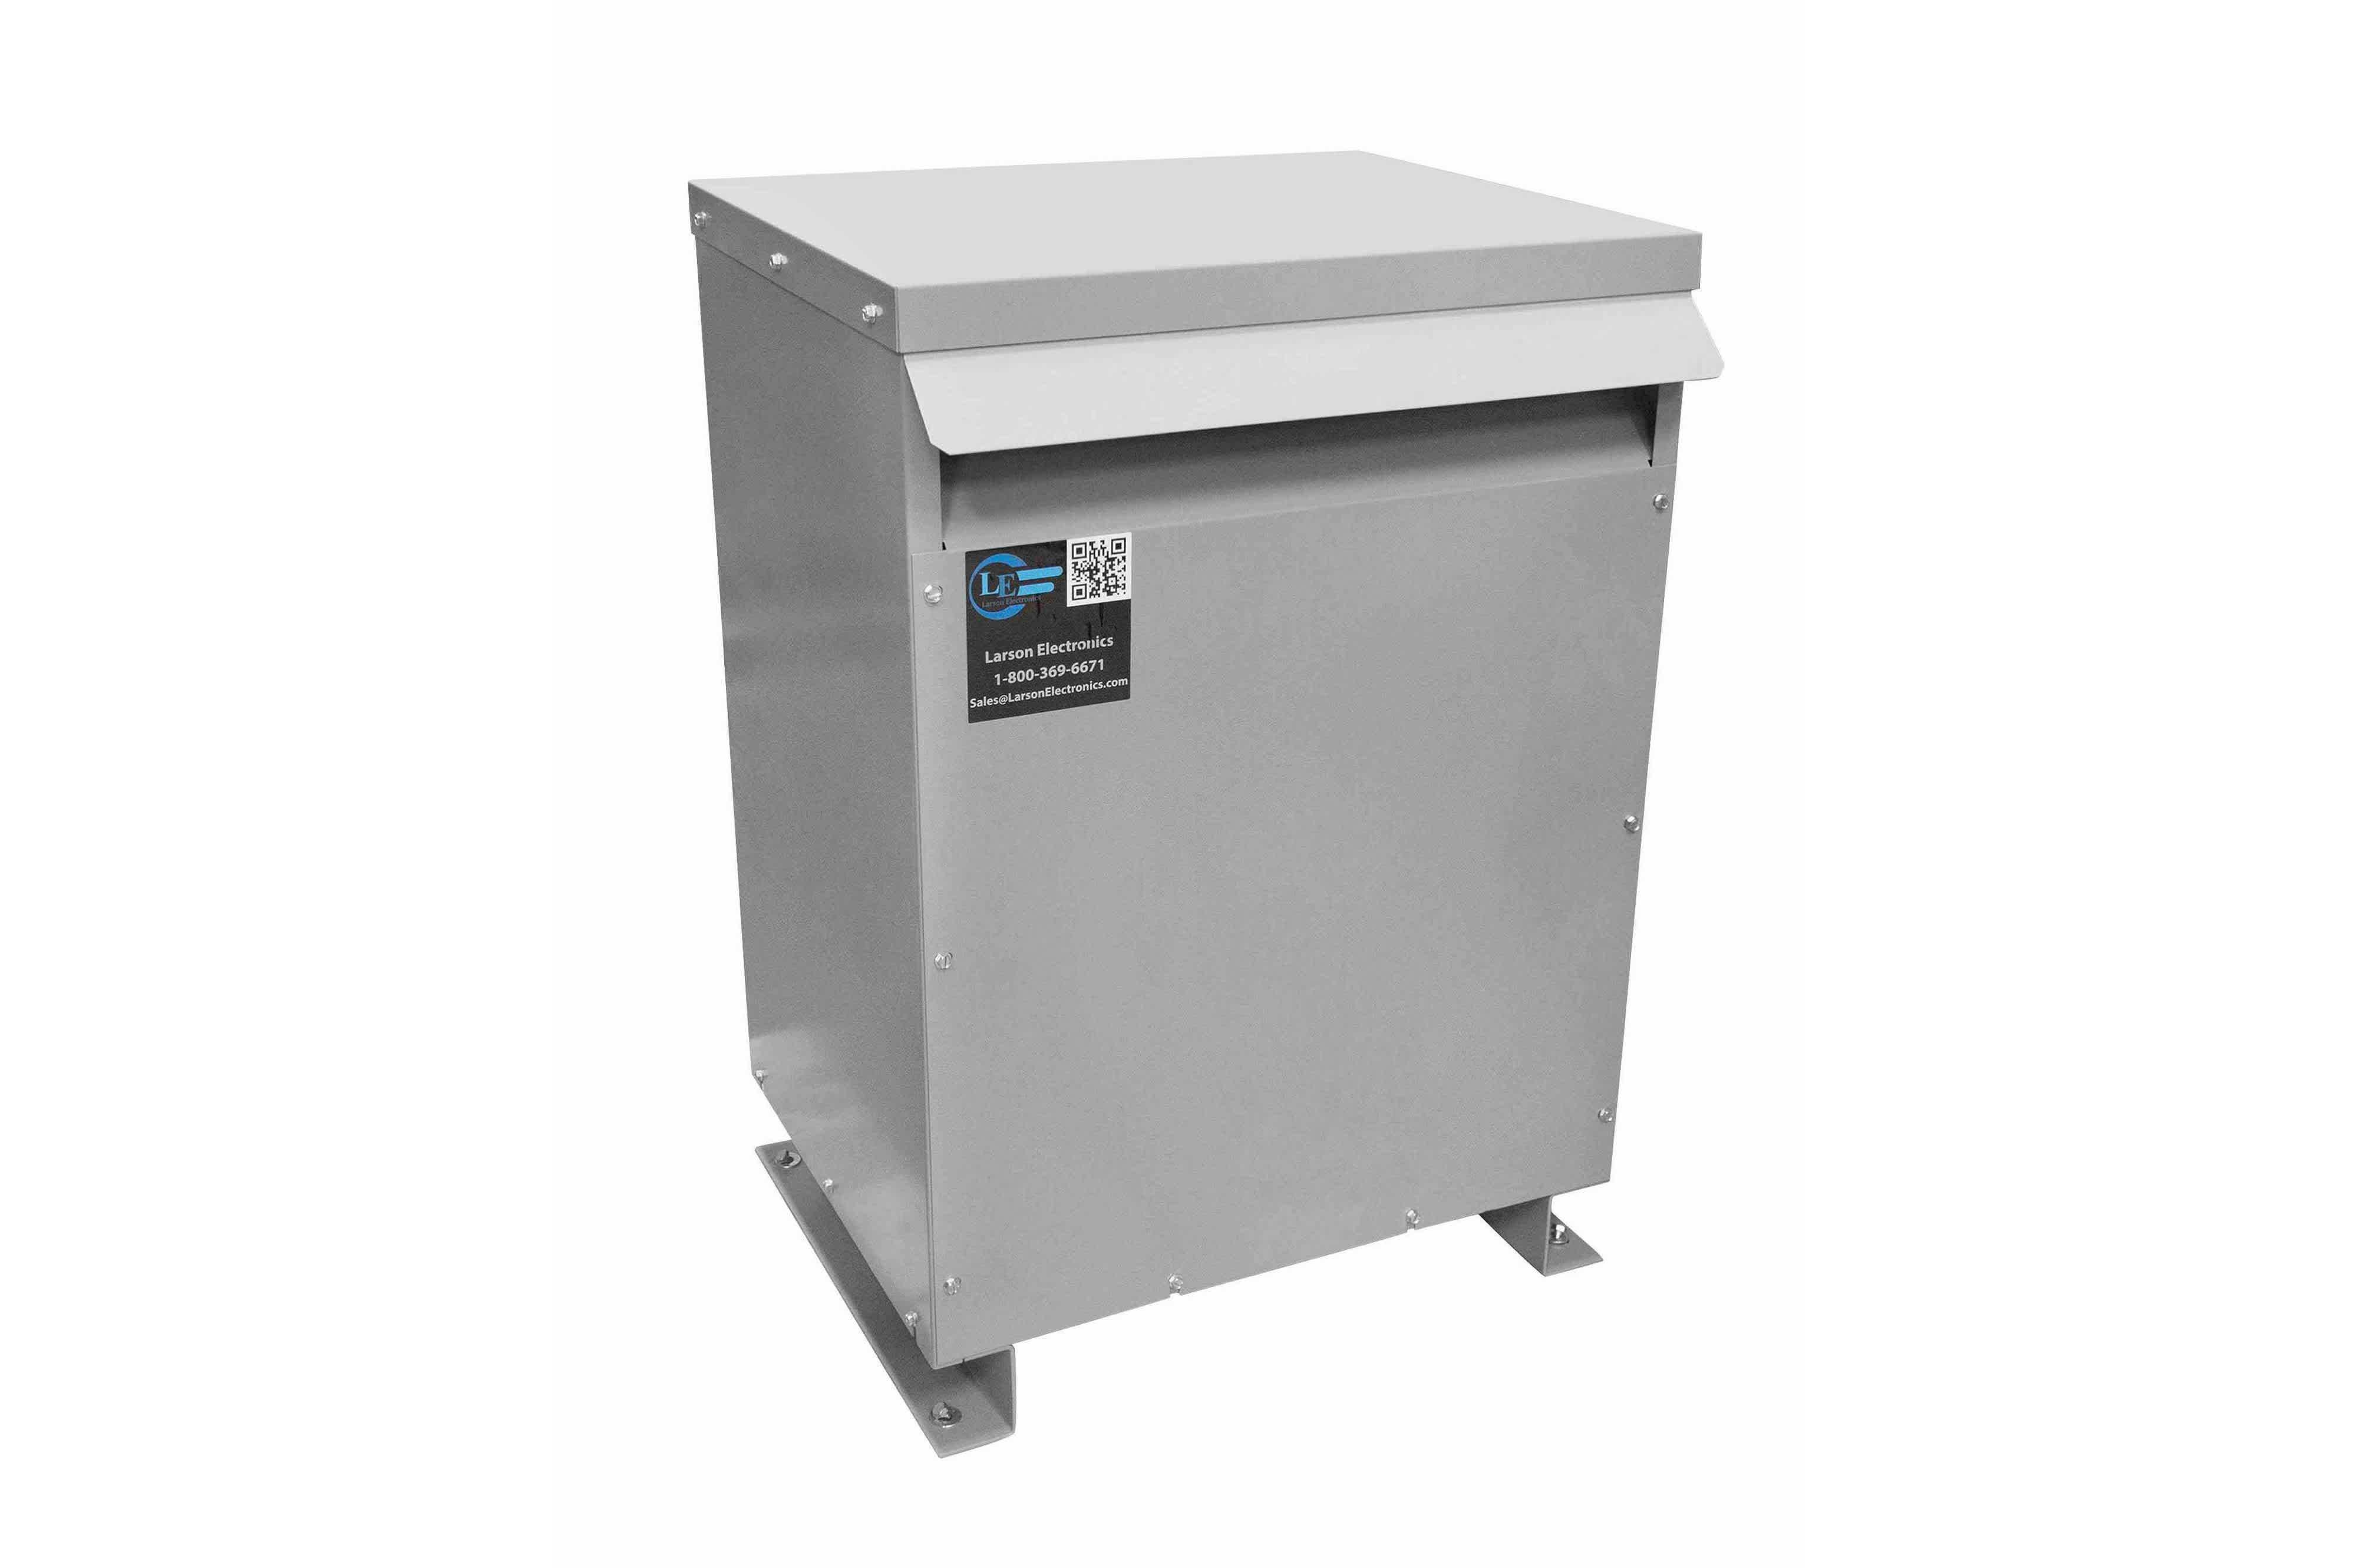 800 kVA 3PH Isolation Transformer, 240V Wye Primary, 208V Delta Secondary, N3R, Ventilated, 60 Hz